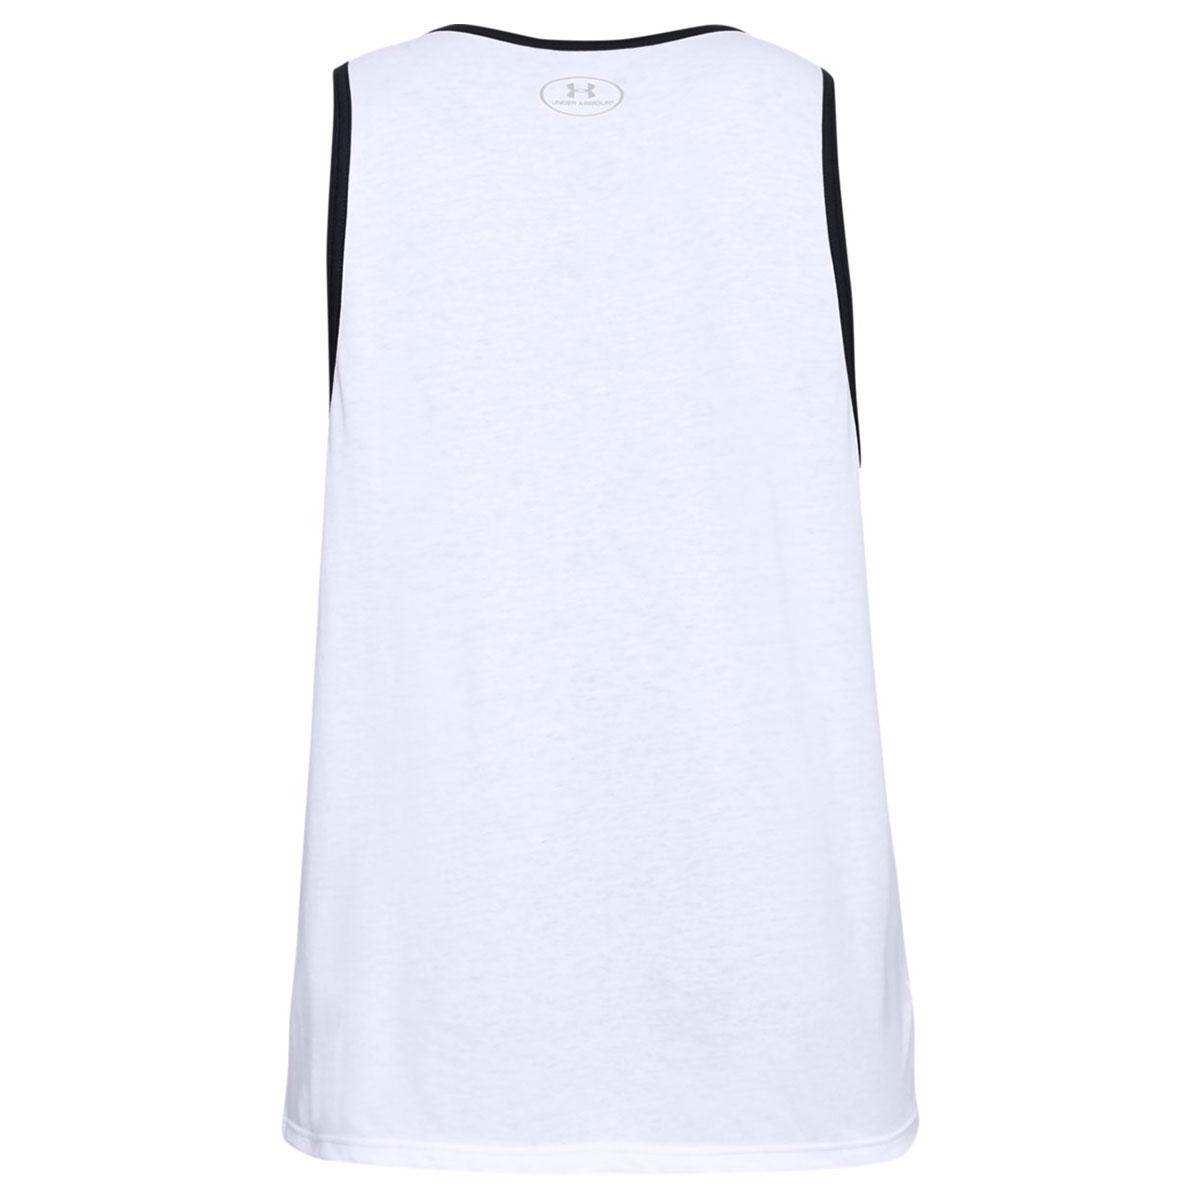 Under-Armour-Mens-2019-Sportstyle-Logo-Tank-Soft-Sleeveless-Cotton-Vest Indexbild 8